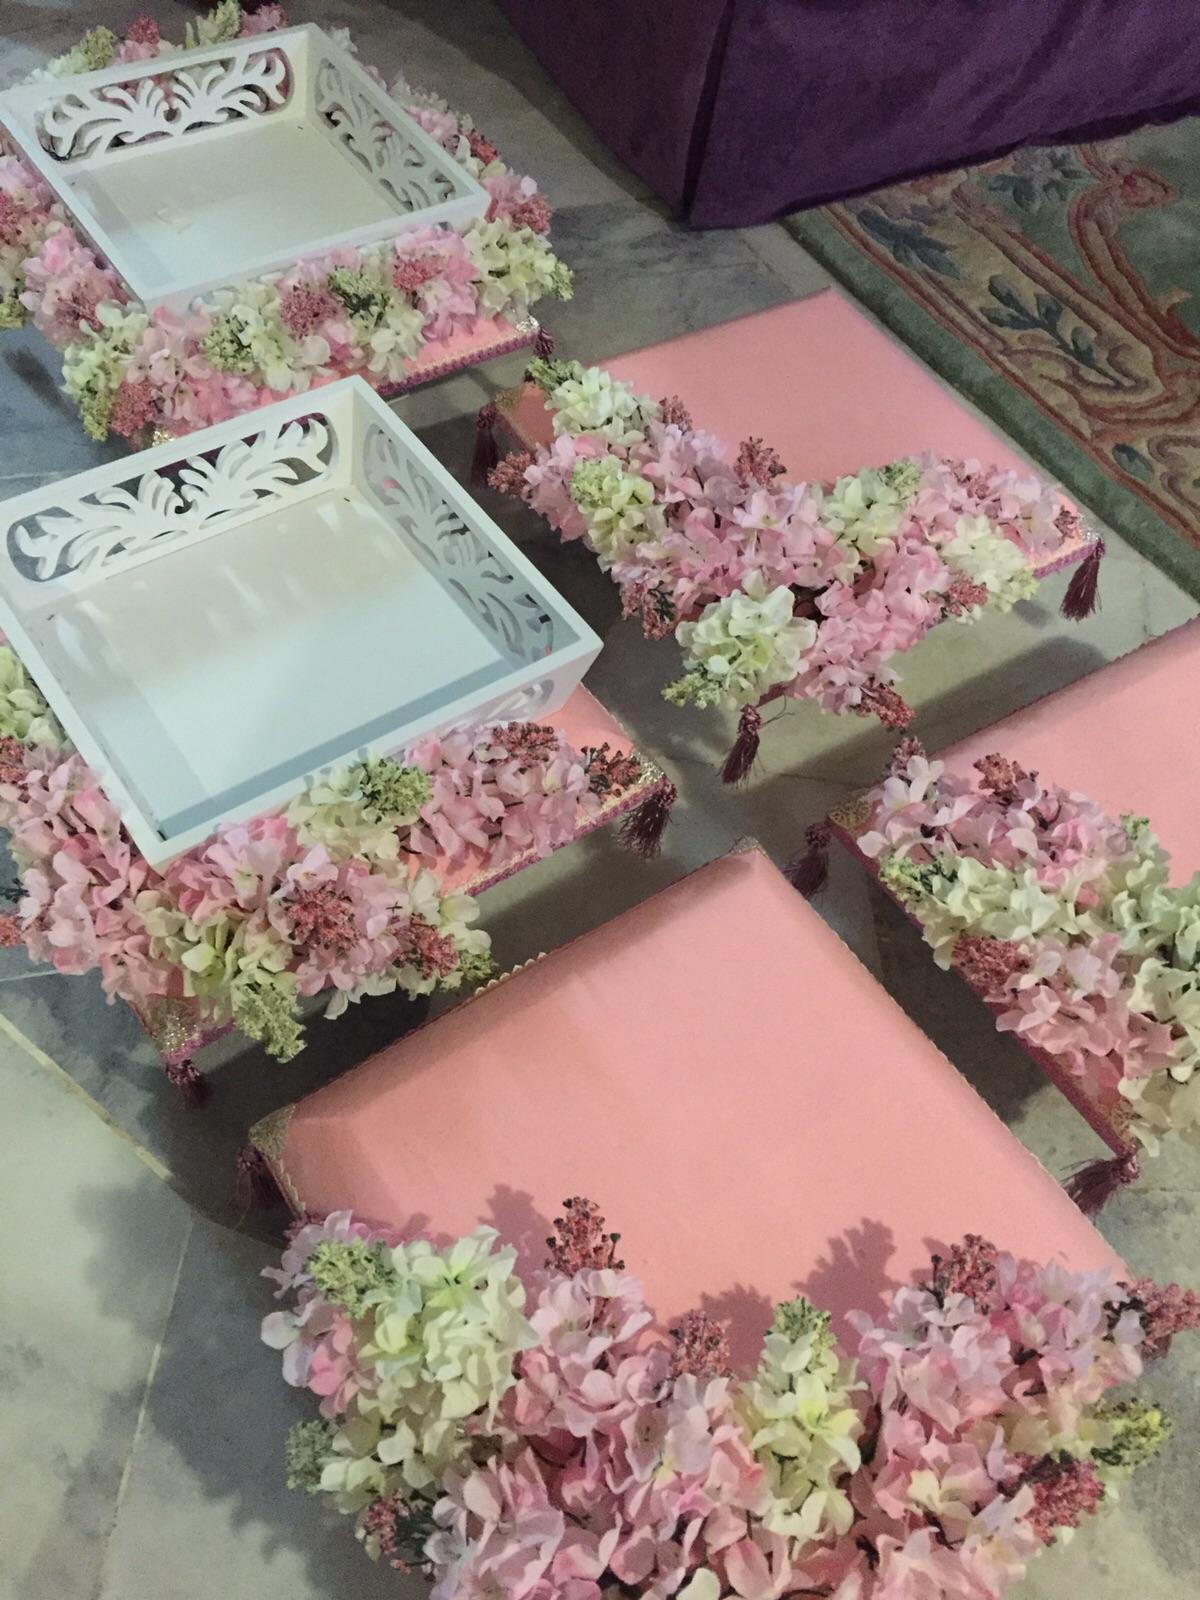 Contoh Gubahan Hantaran Warna Pink Watch Chaos Season